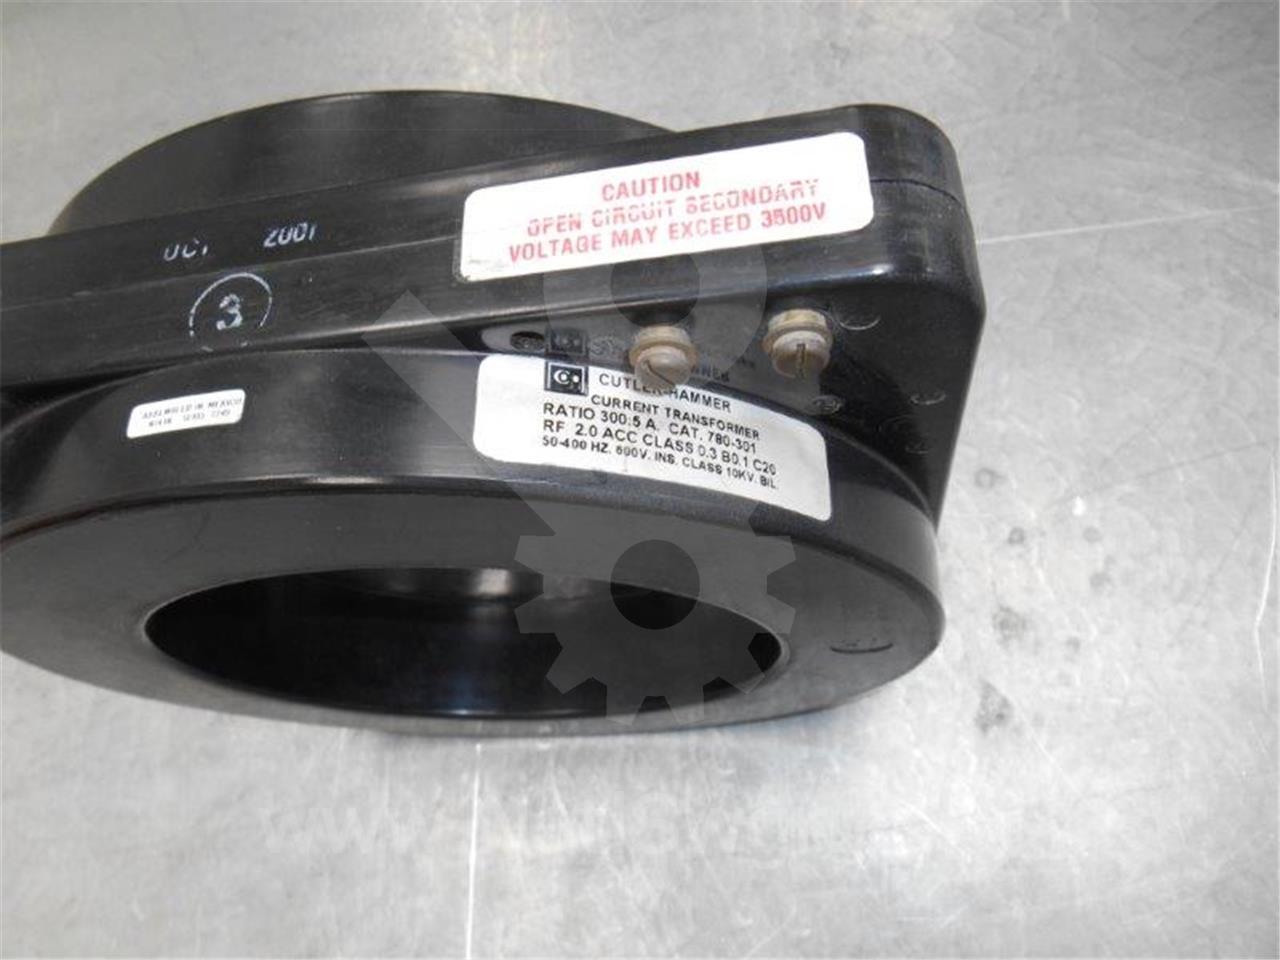 780-301 Cutler-Hammer CURRENT TRANSFORMER 300:5, NEW C20, 10KV BIL, UNUSED NEW